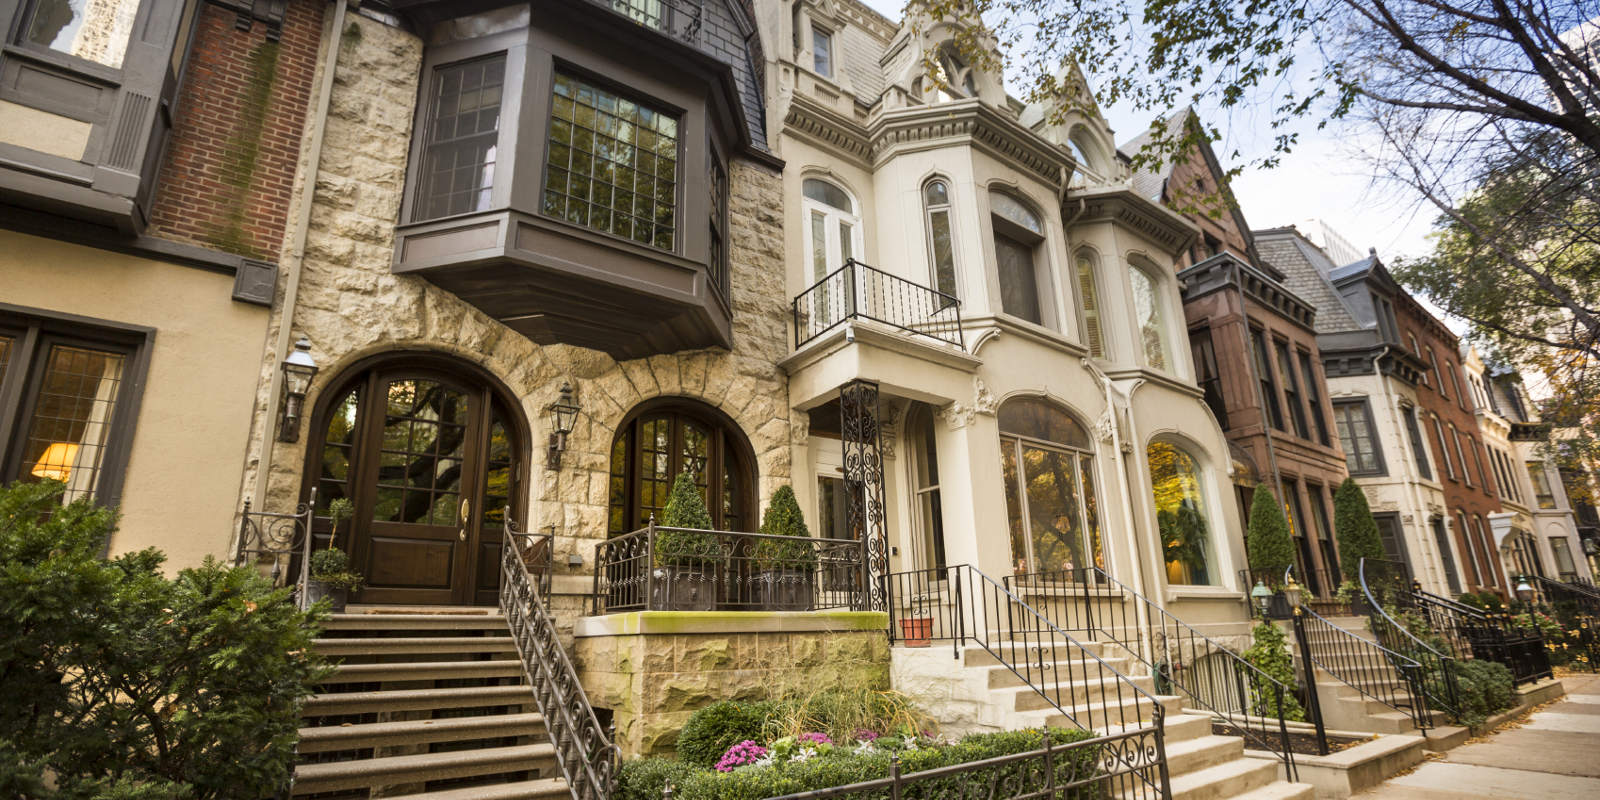 Landmark classic residential street in Chicago Illinois USA